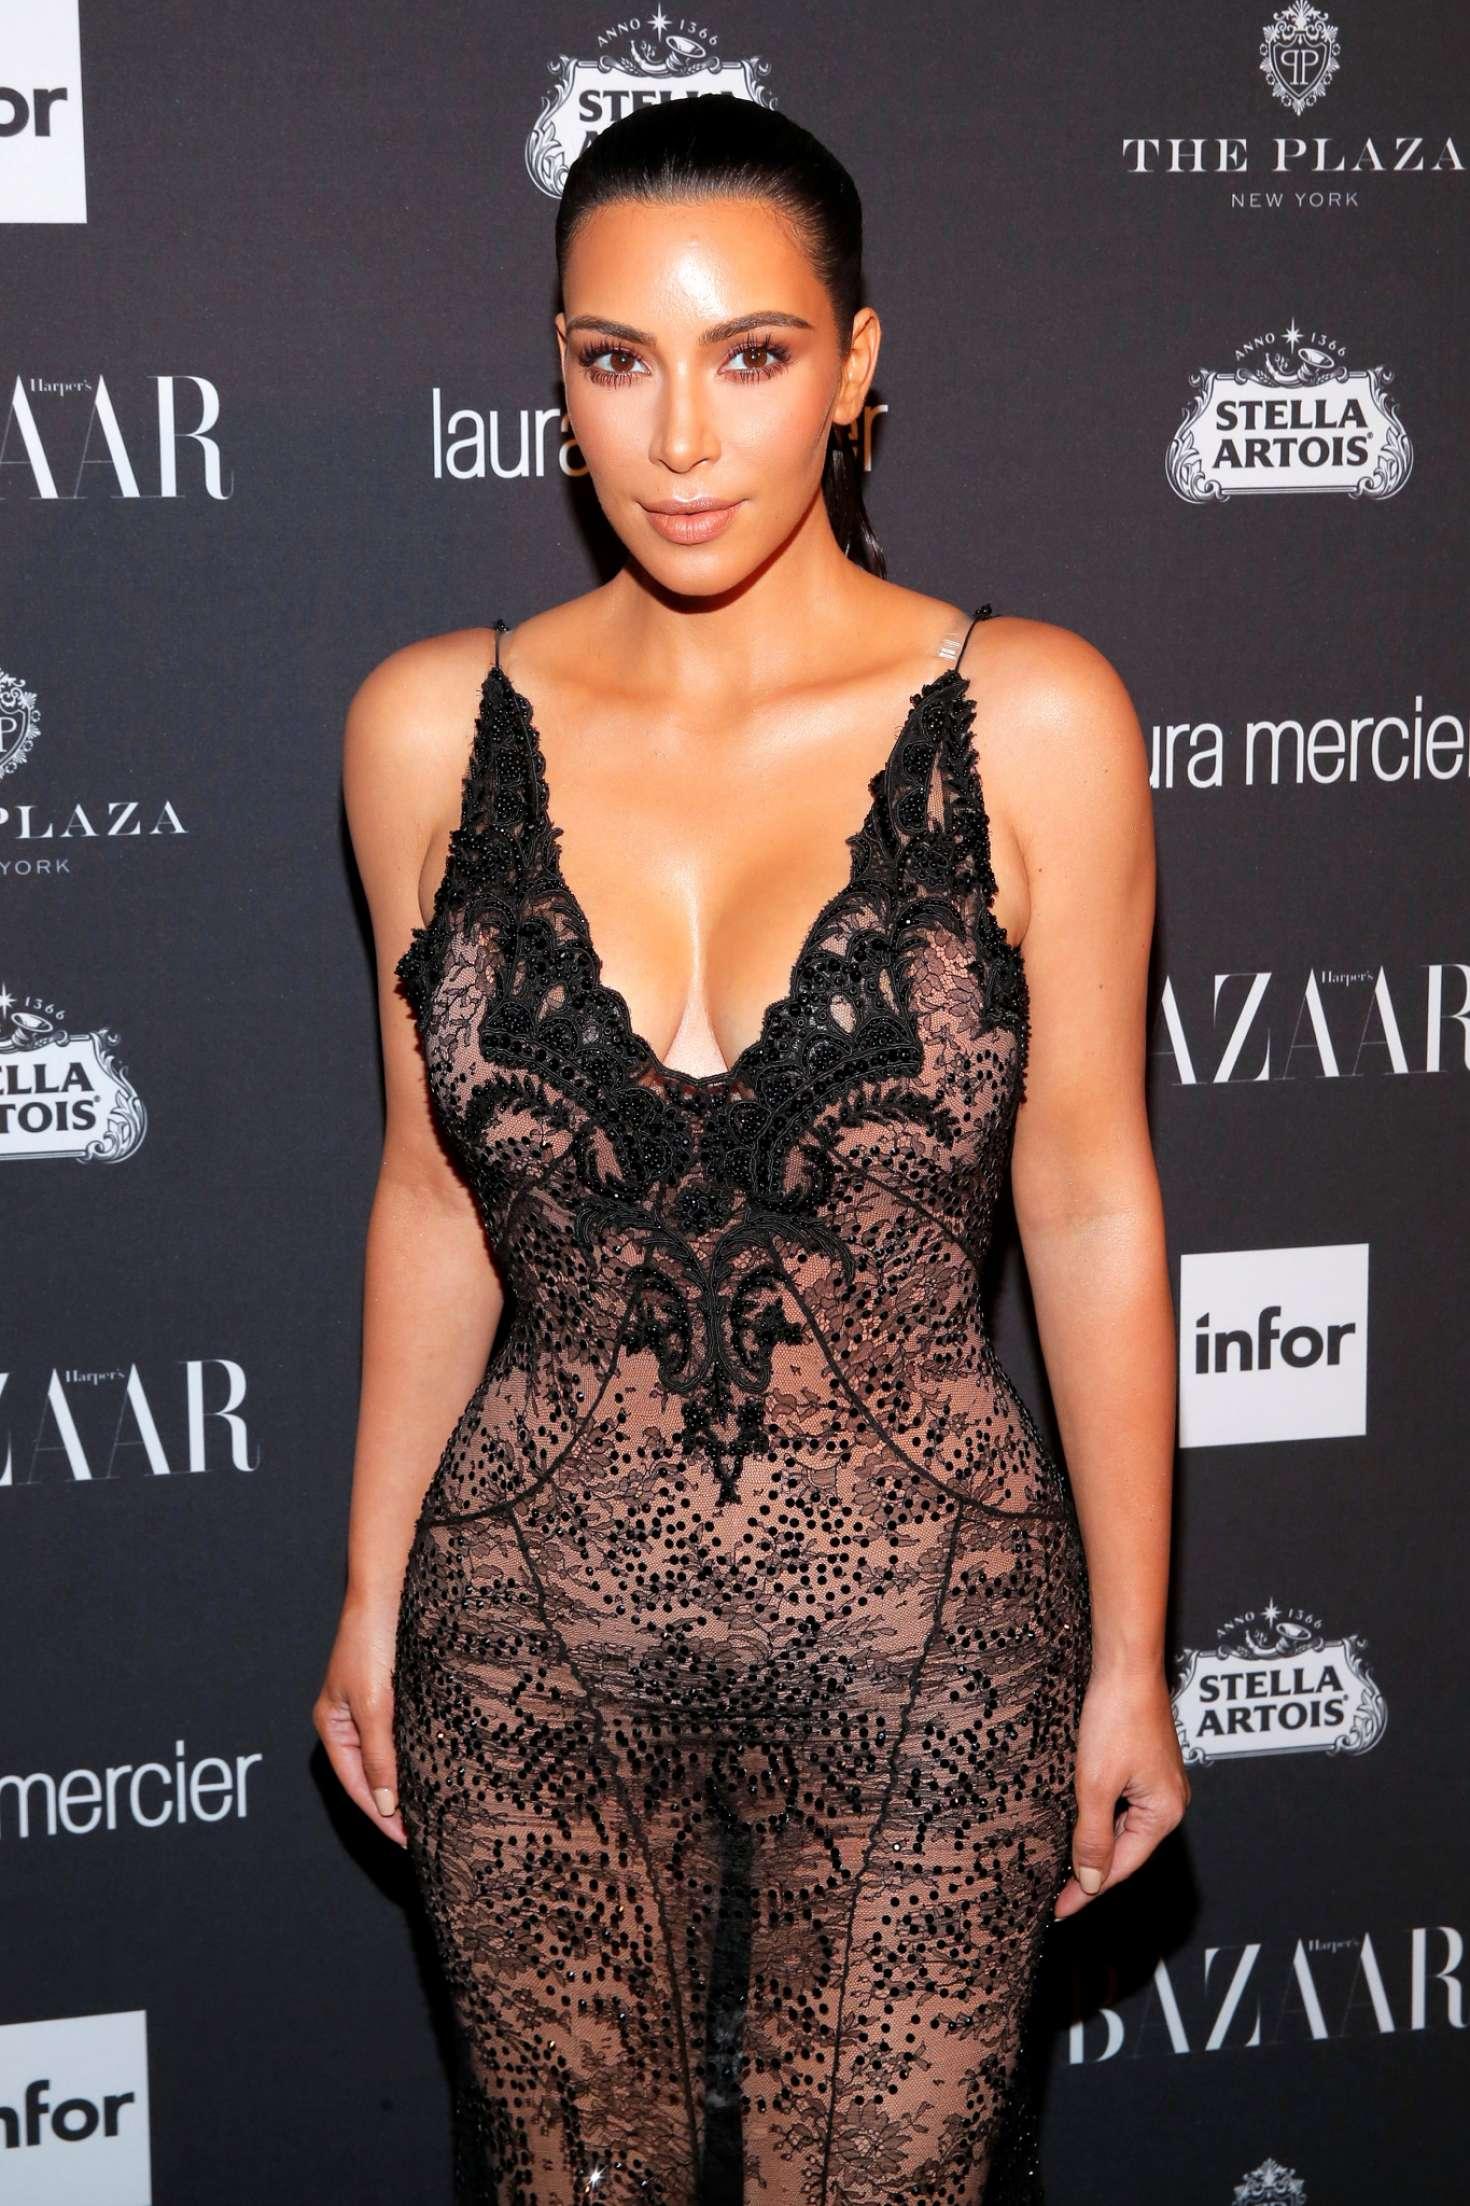 Kim Kardashian Harpers Bazaar Icons Party 2016 In NYC